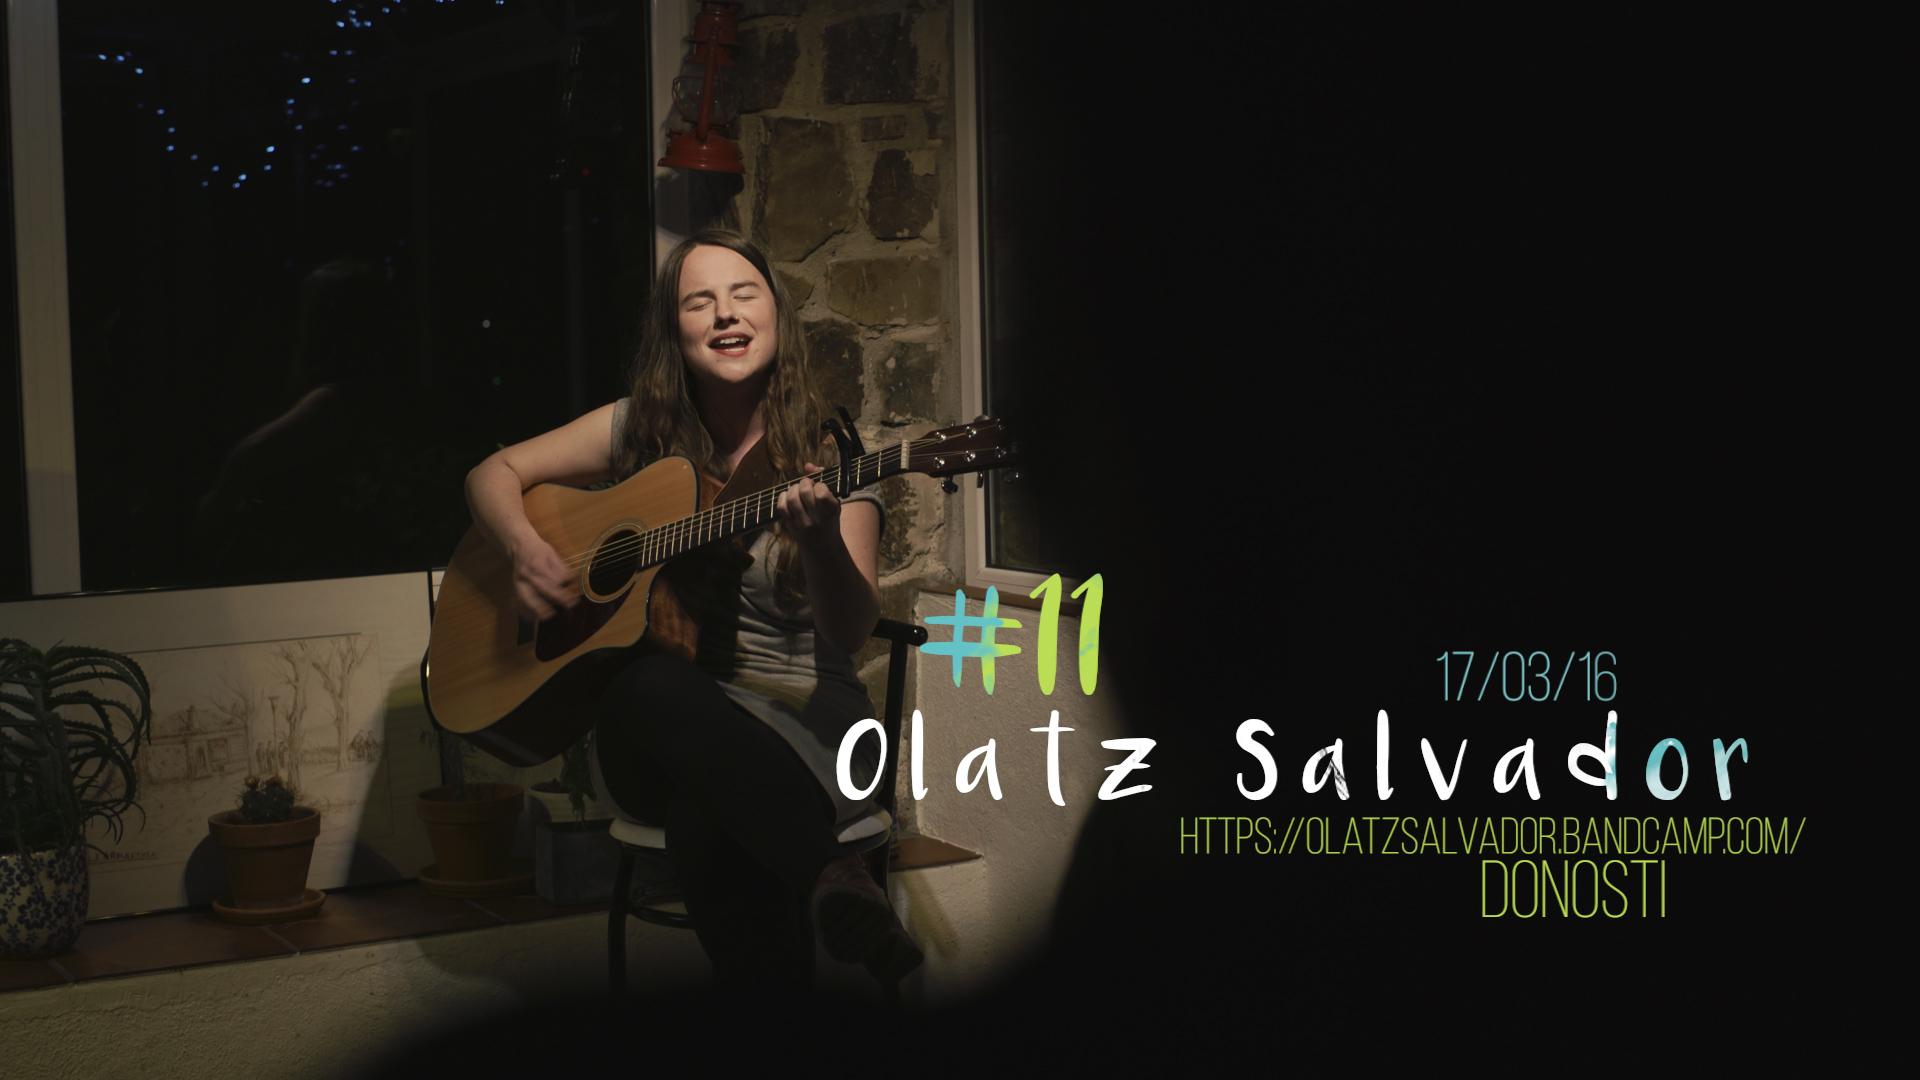 OLATZ SALVADOR - LOKARRIAK